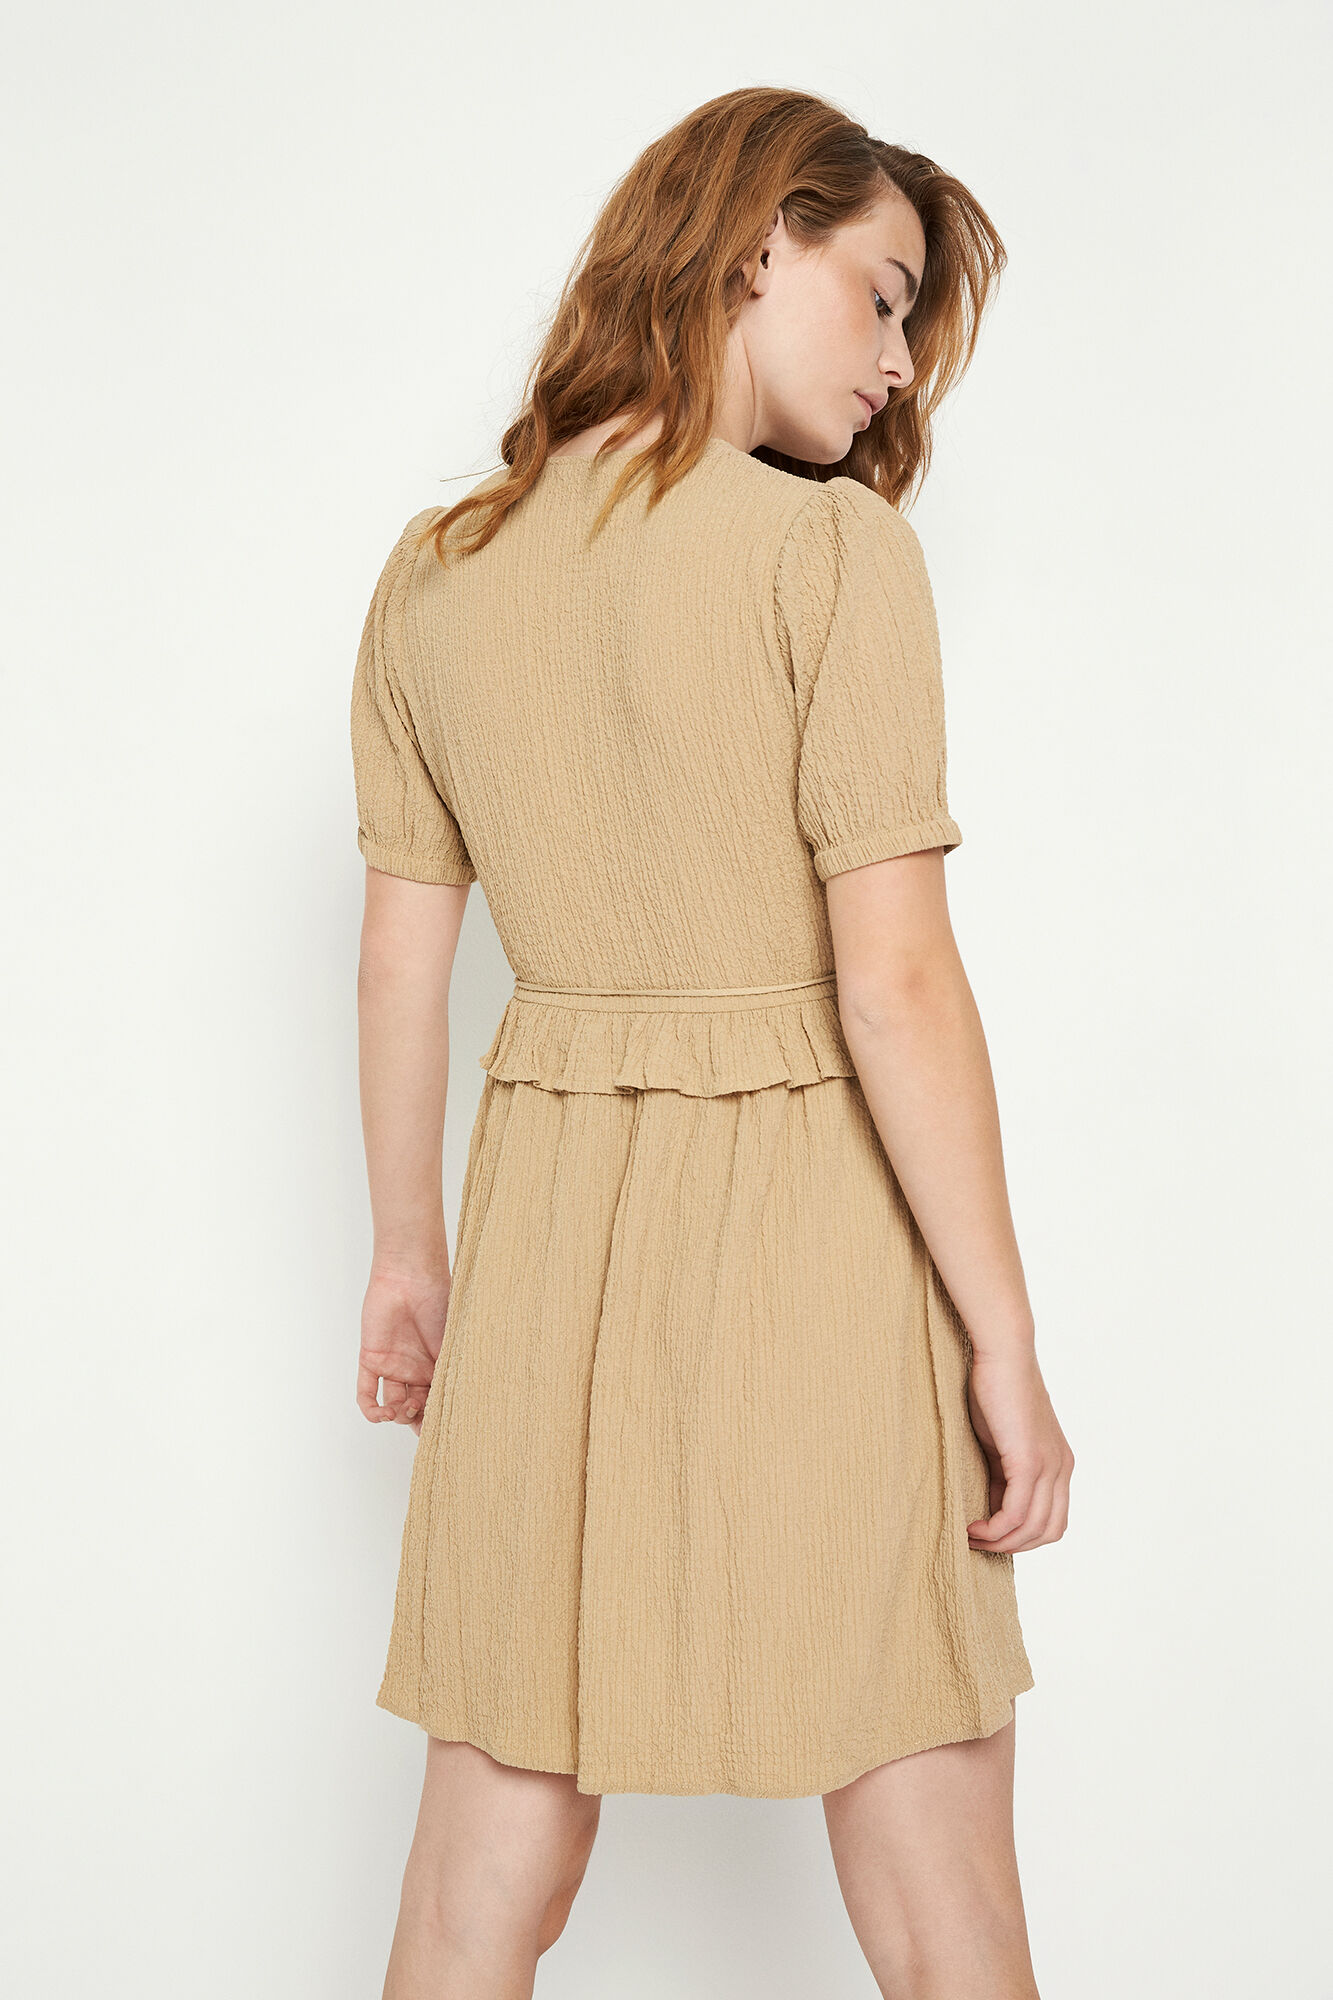 ENSYMPHONY SS DRESS 6737